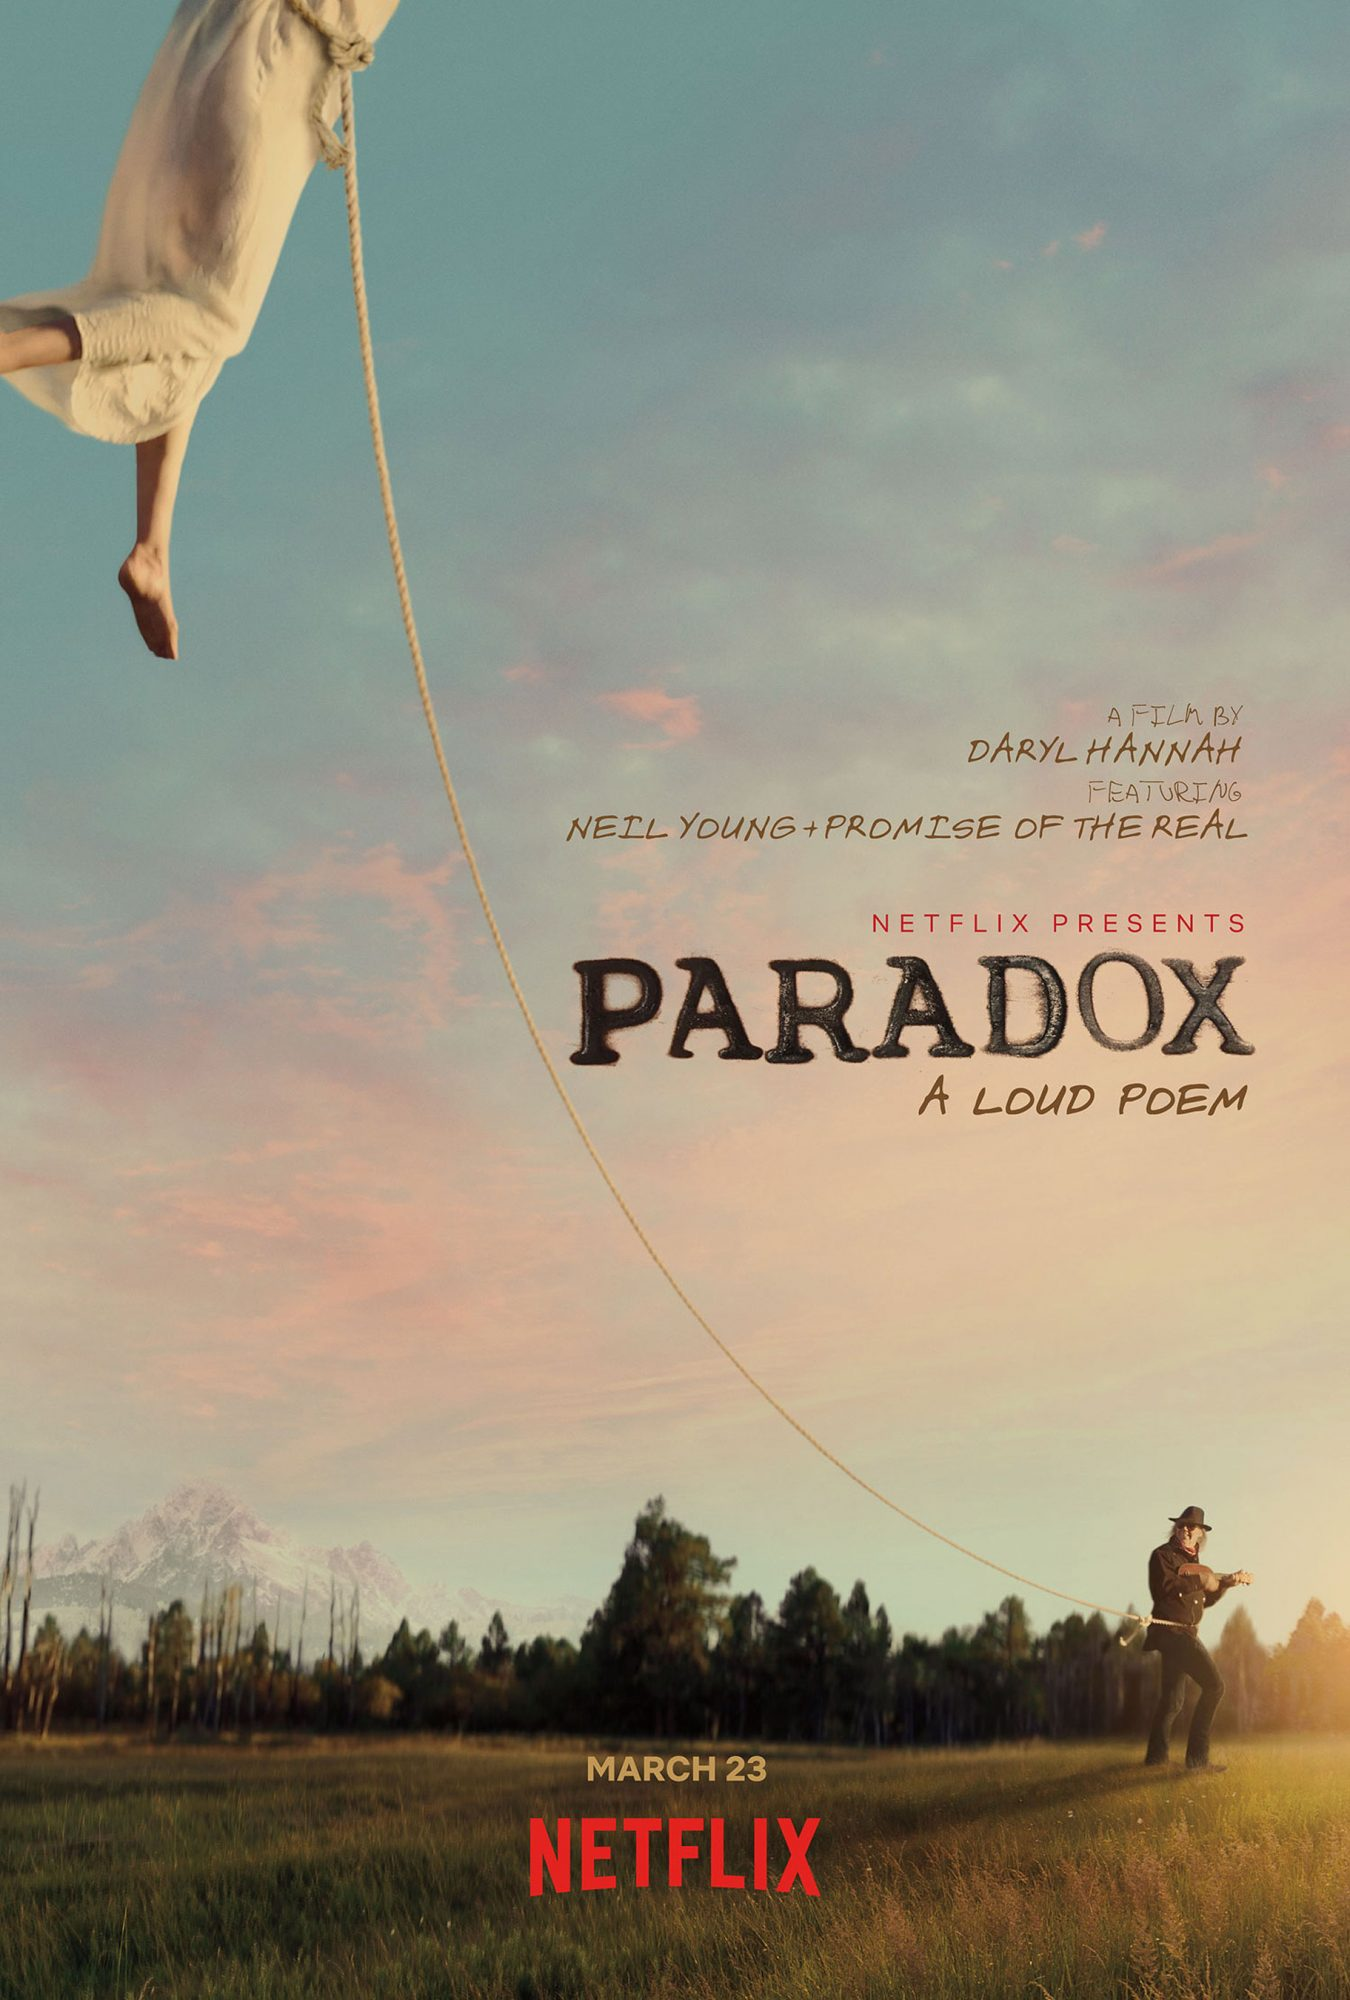 Paradox Neil YoungCredit: Netflix